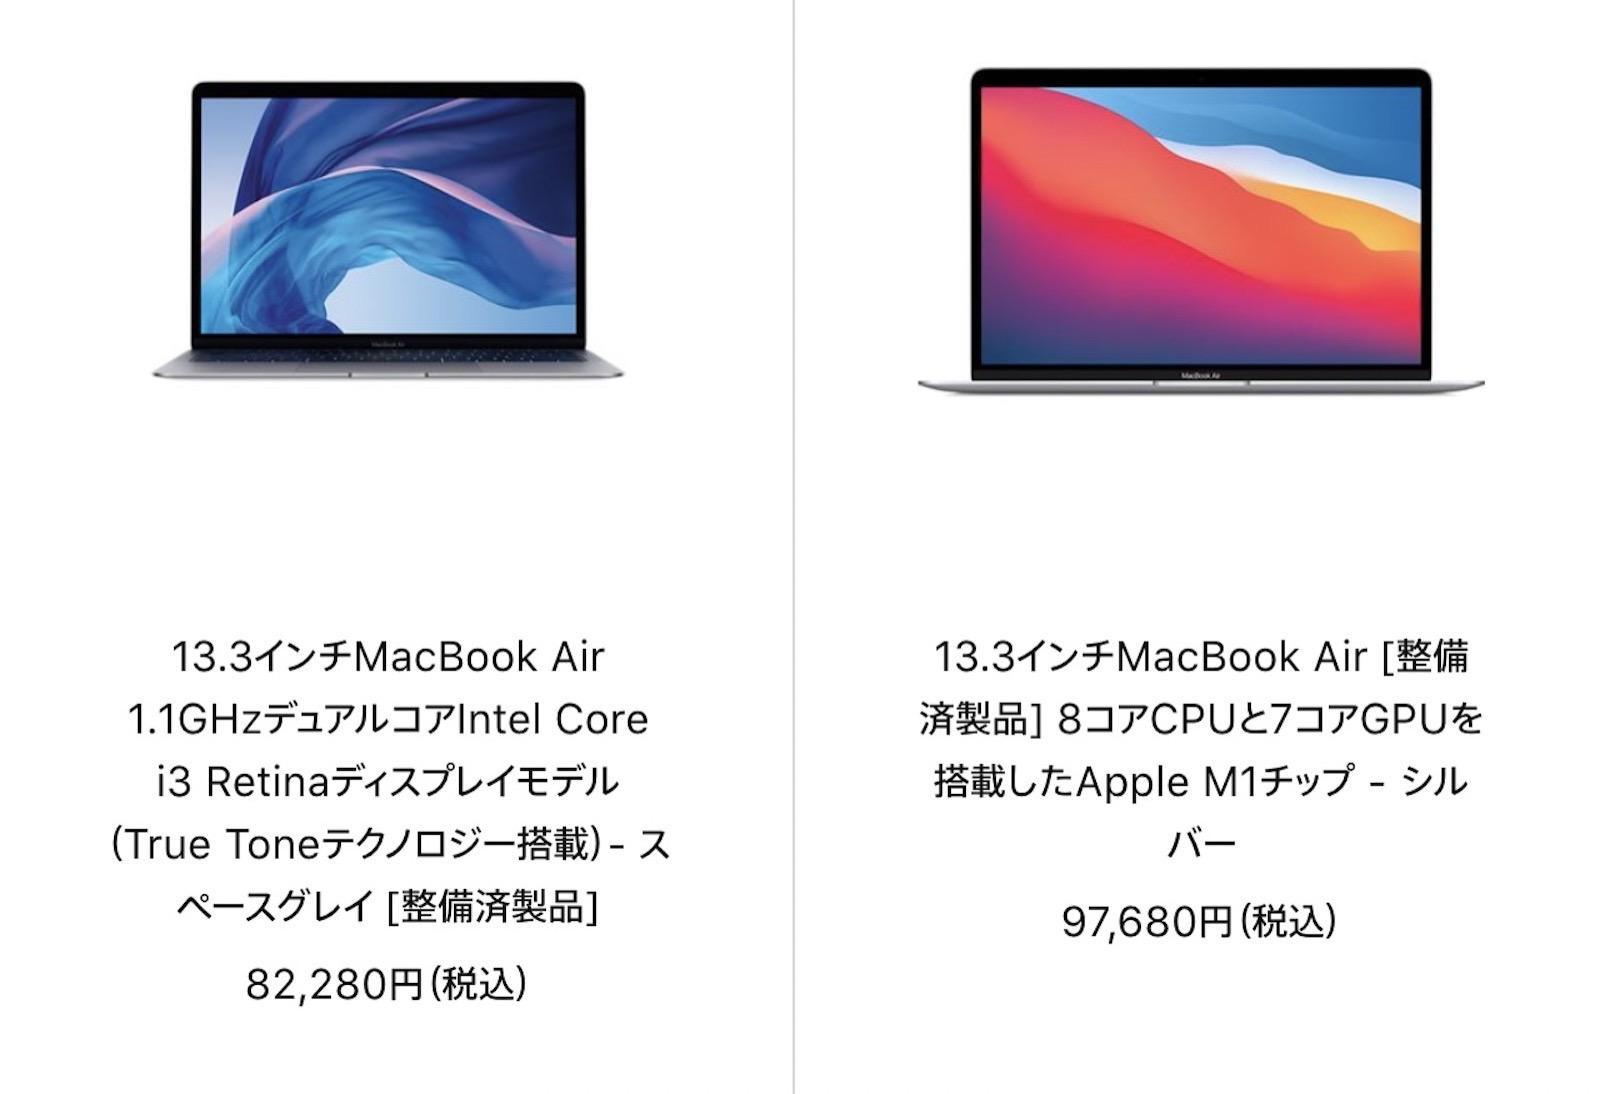 M1 or intel macbookair Mac Refurbished model 2021 07 25